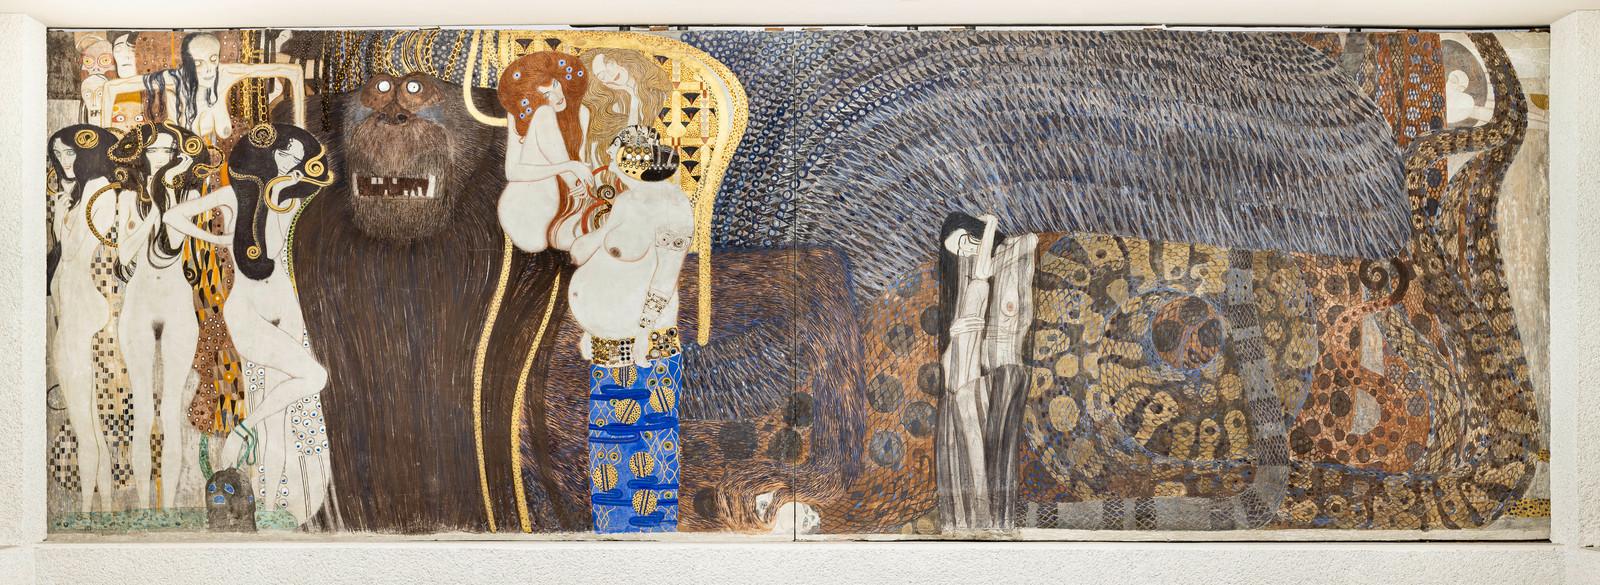 Gustav Klimt, Beethoven-fries, smalle muur (The Hostile Forces), Secession, Wenen.